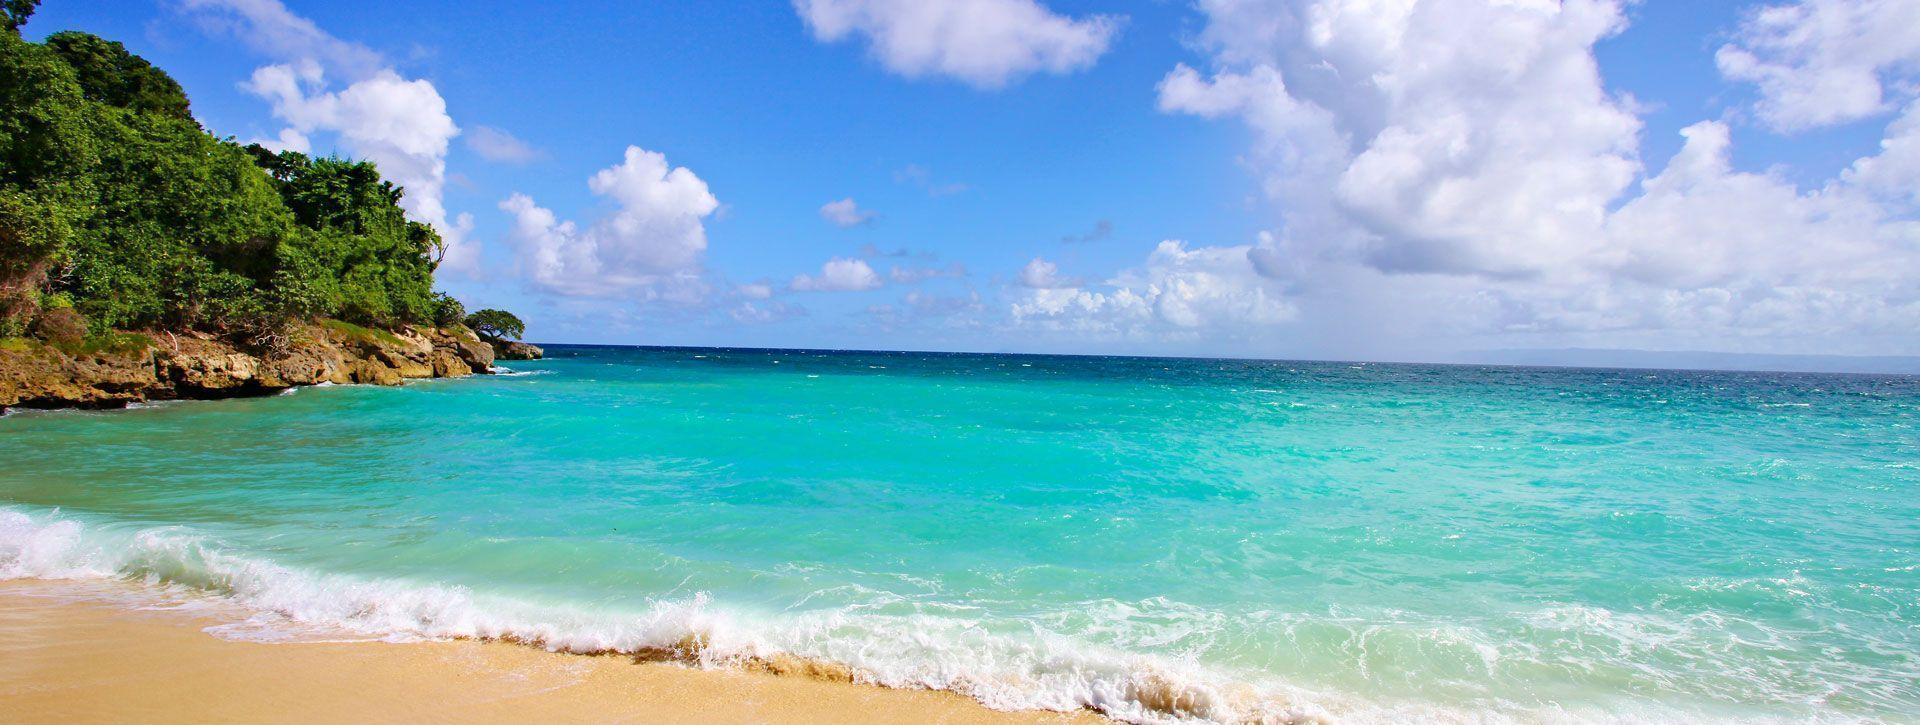 Cayo-Levantado-Samaná-Isla-Bacardí-República-Dominicana